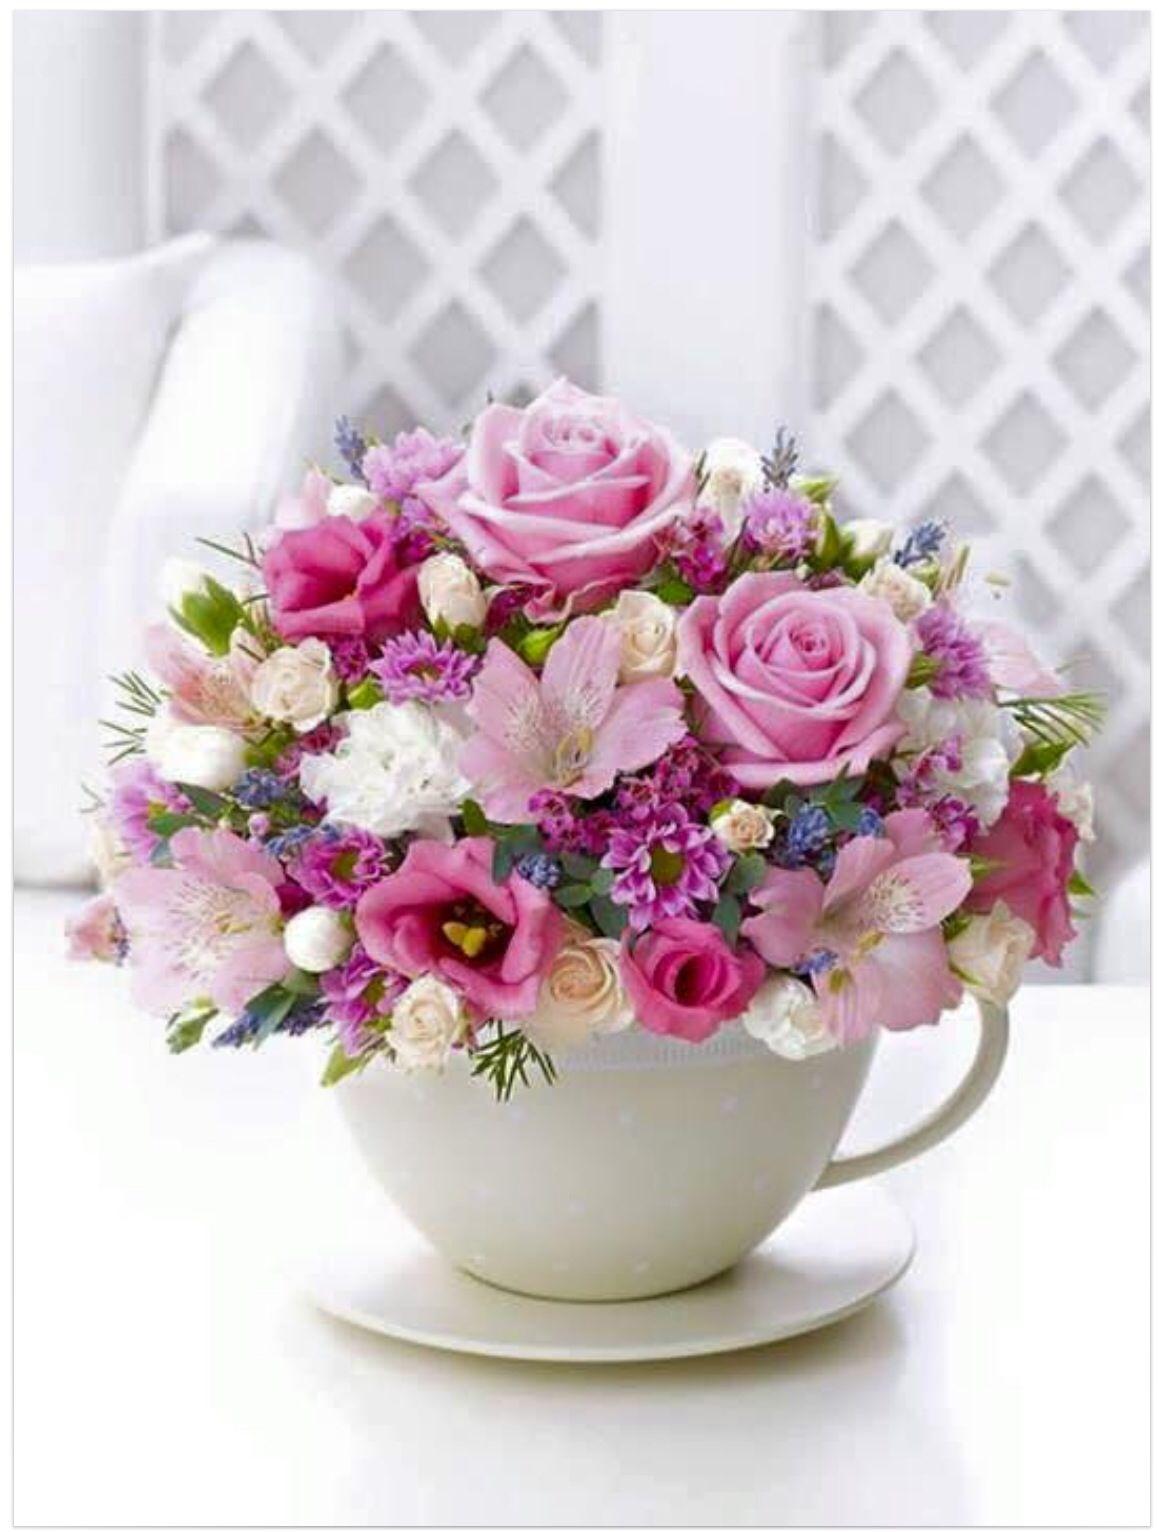 Pastel Teacup and Saucer Arrangement - Interflora. More beautiful flower  arrangements!